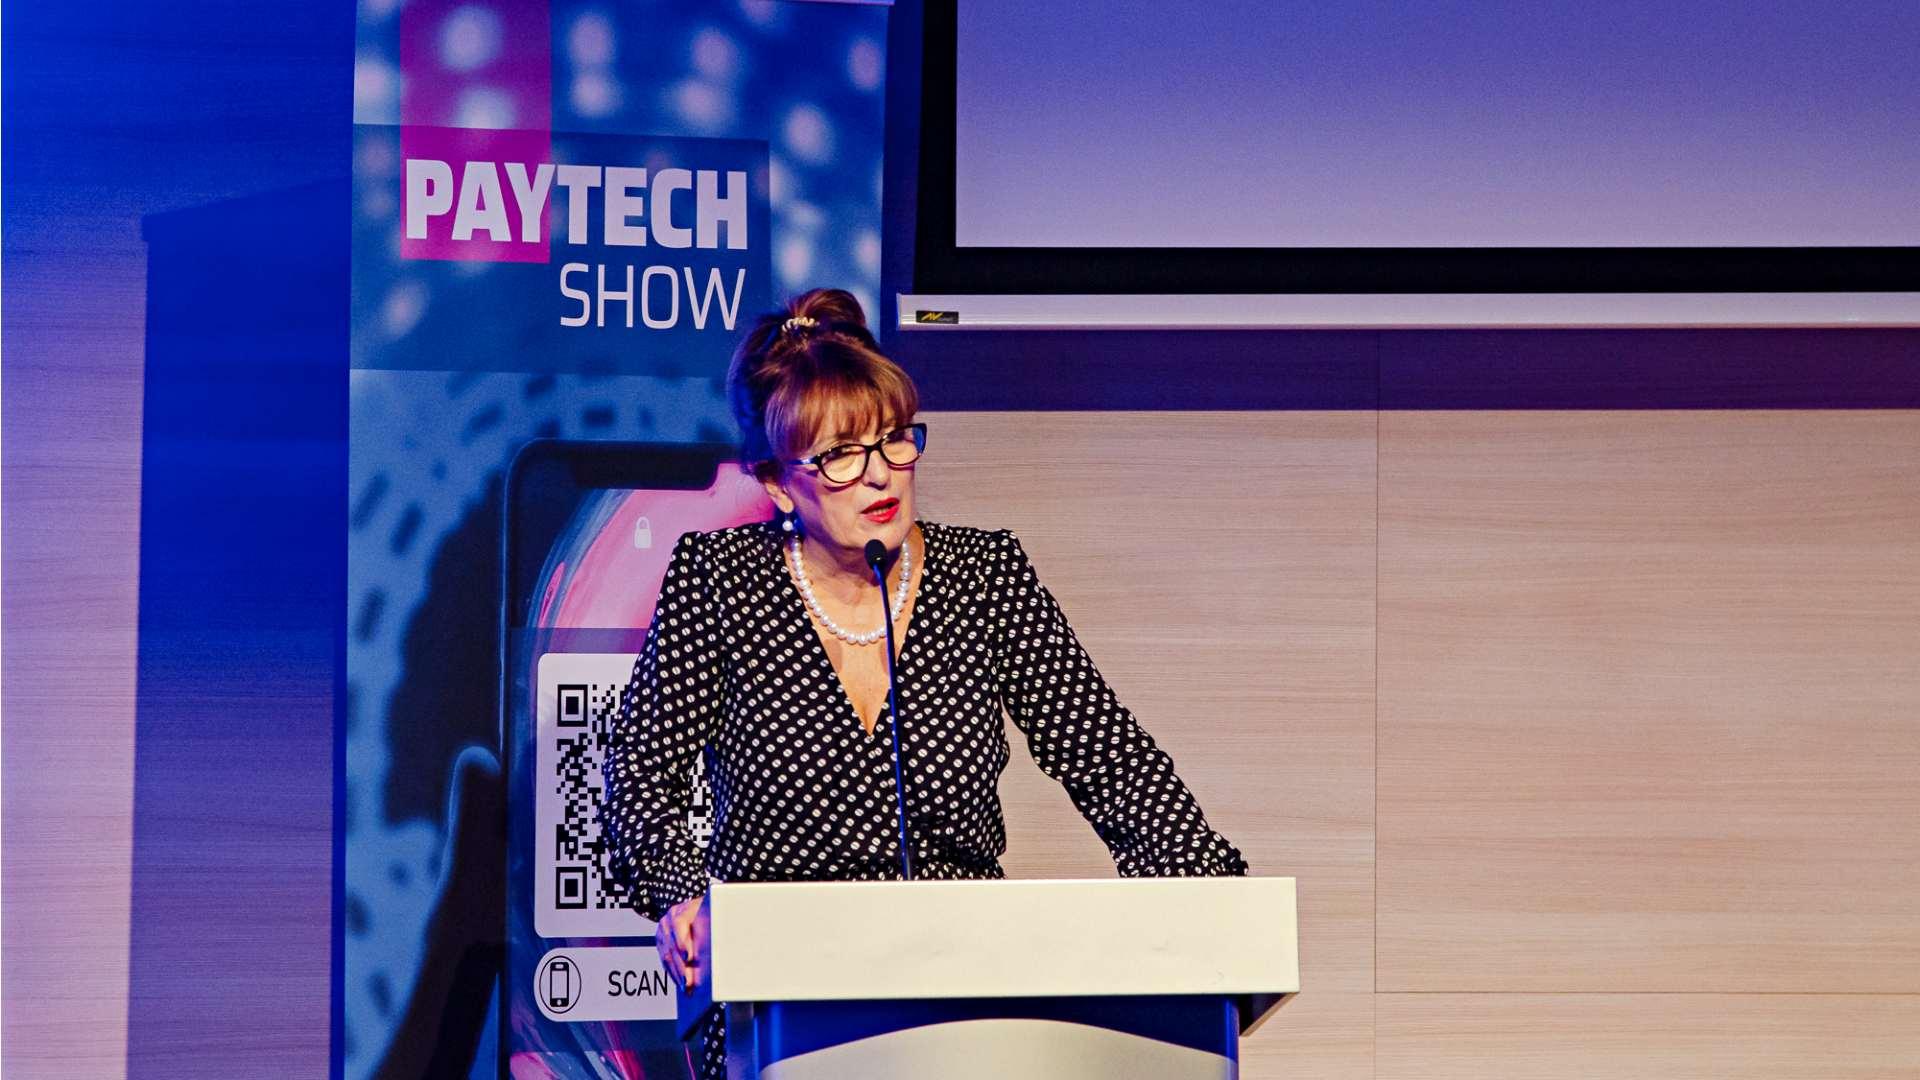 paytechshow granit bank hegedus eva